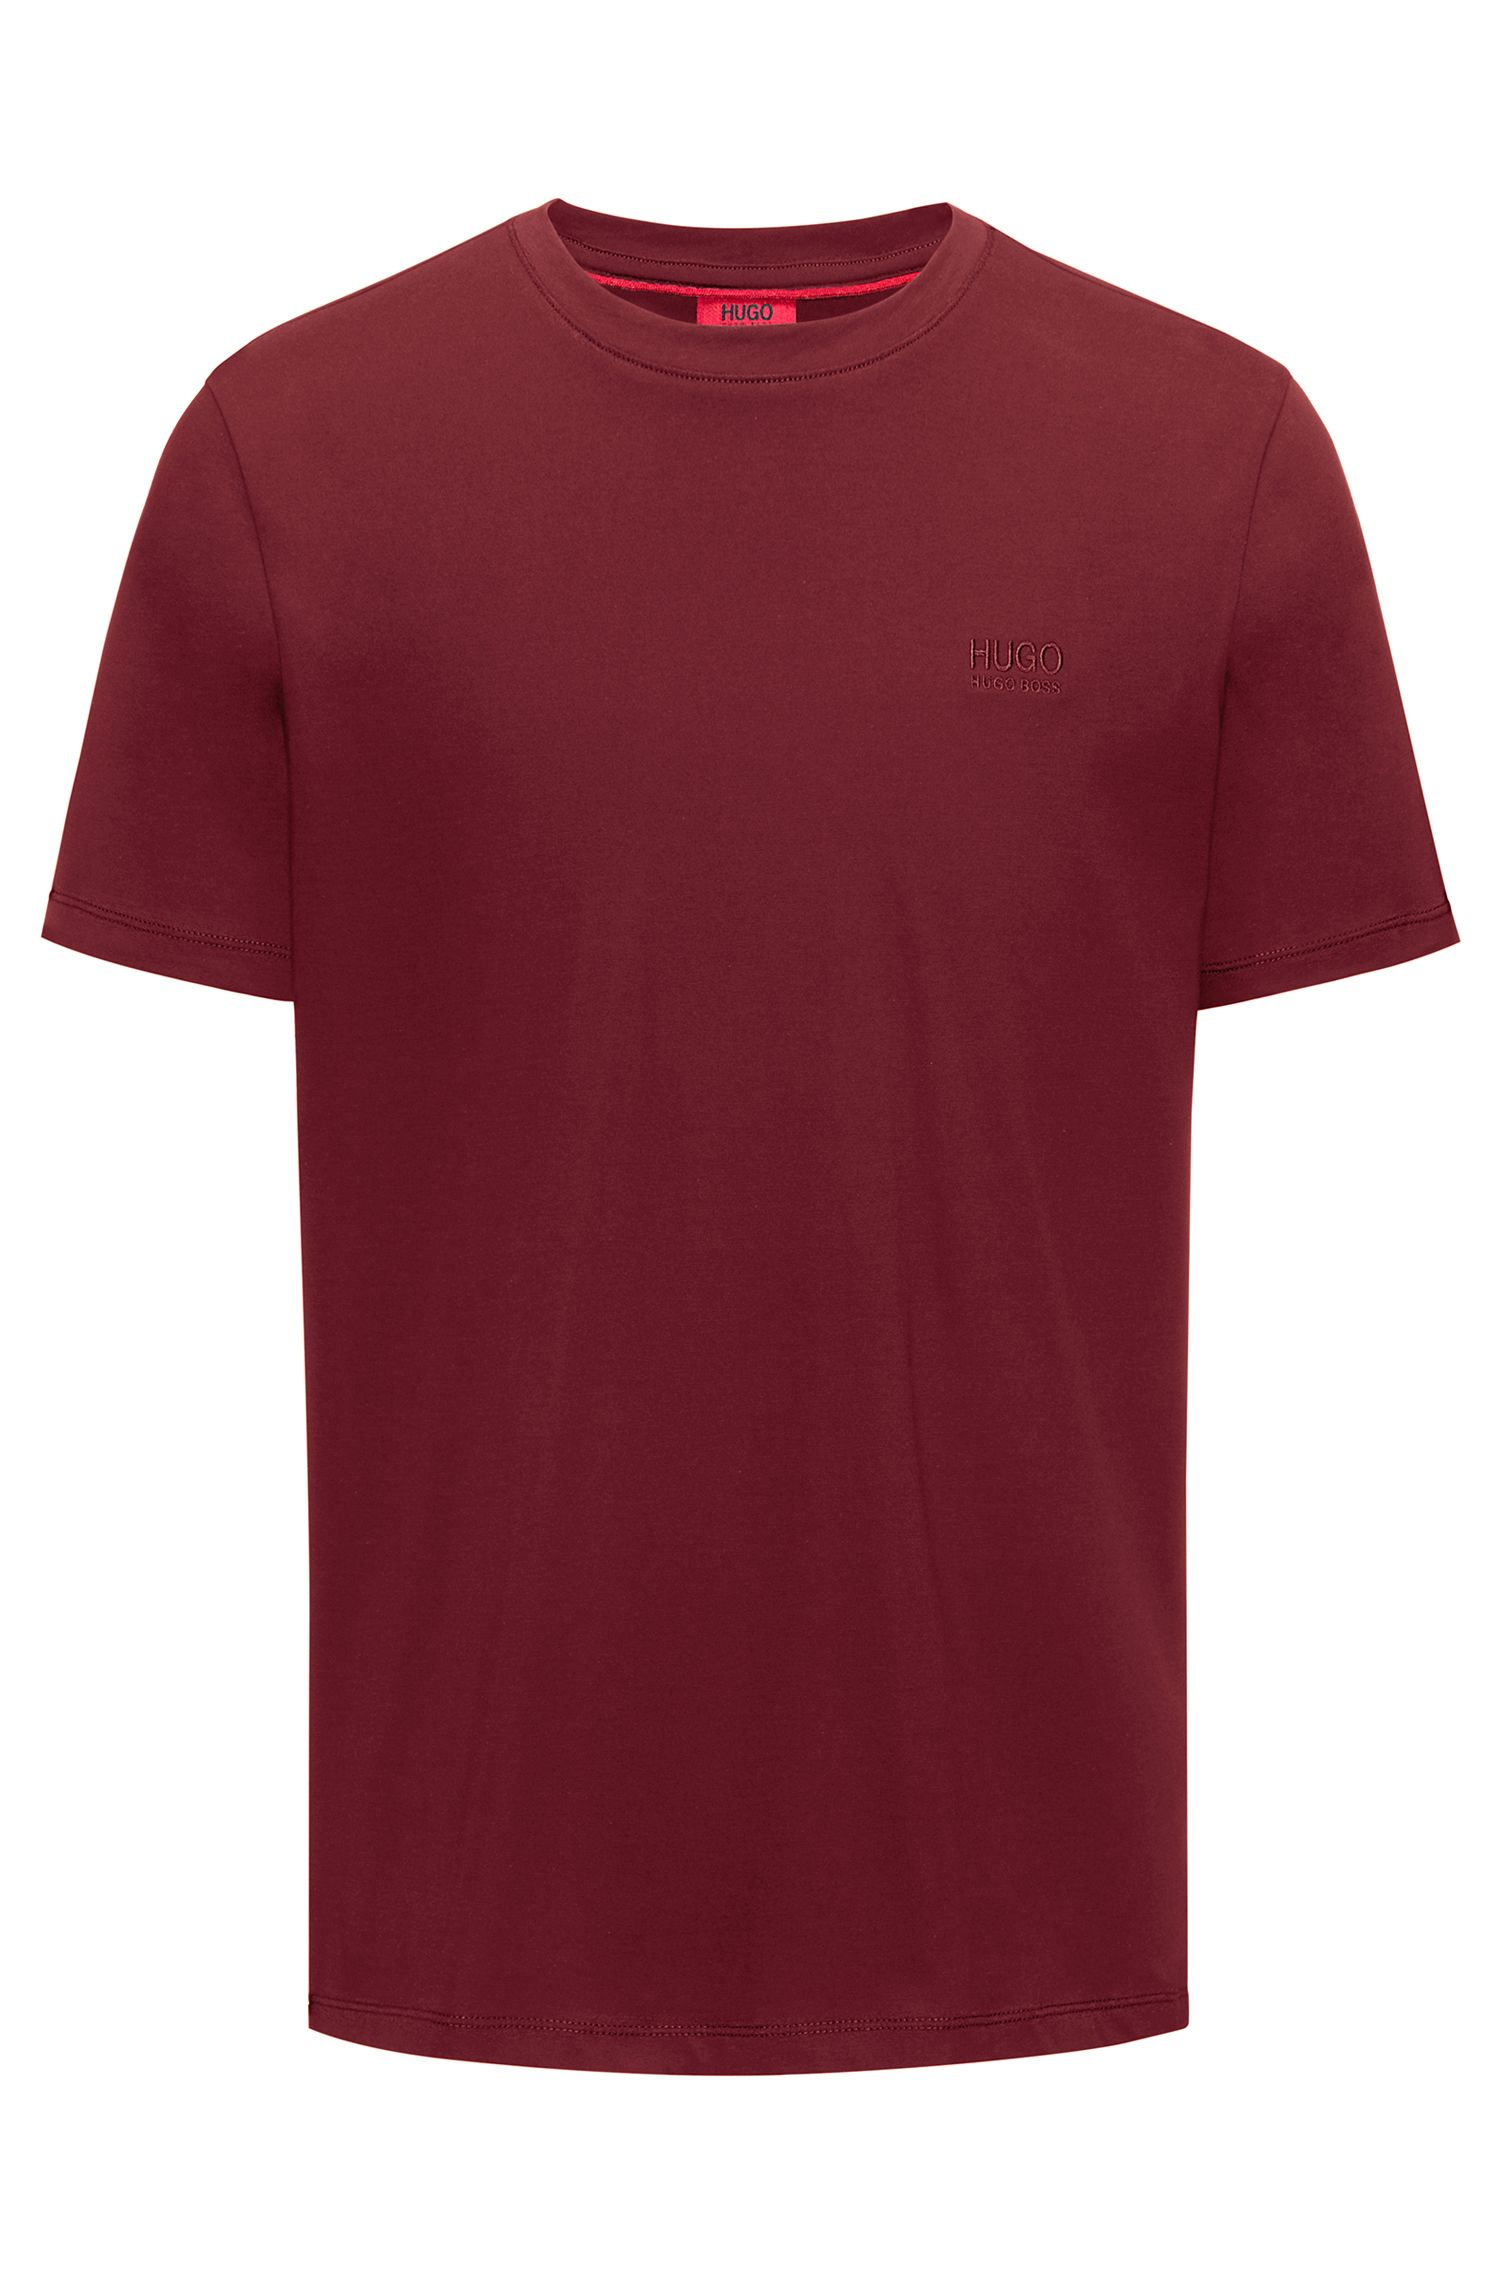 T-shirt regular fit in morbido cotone con logo